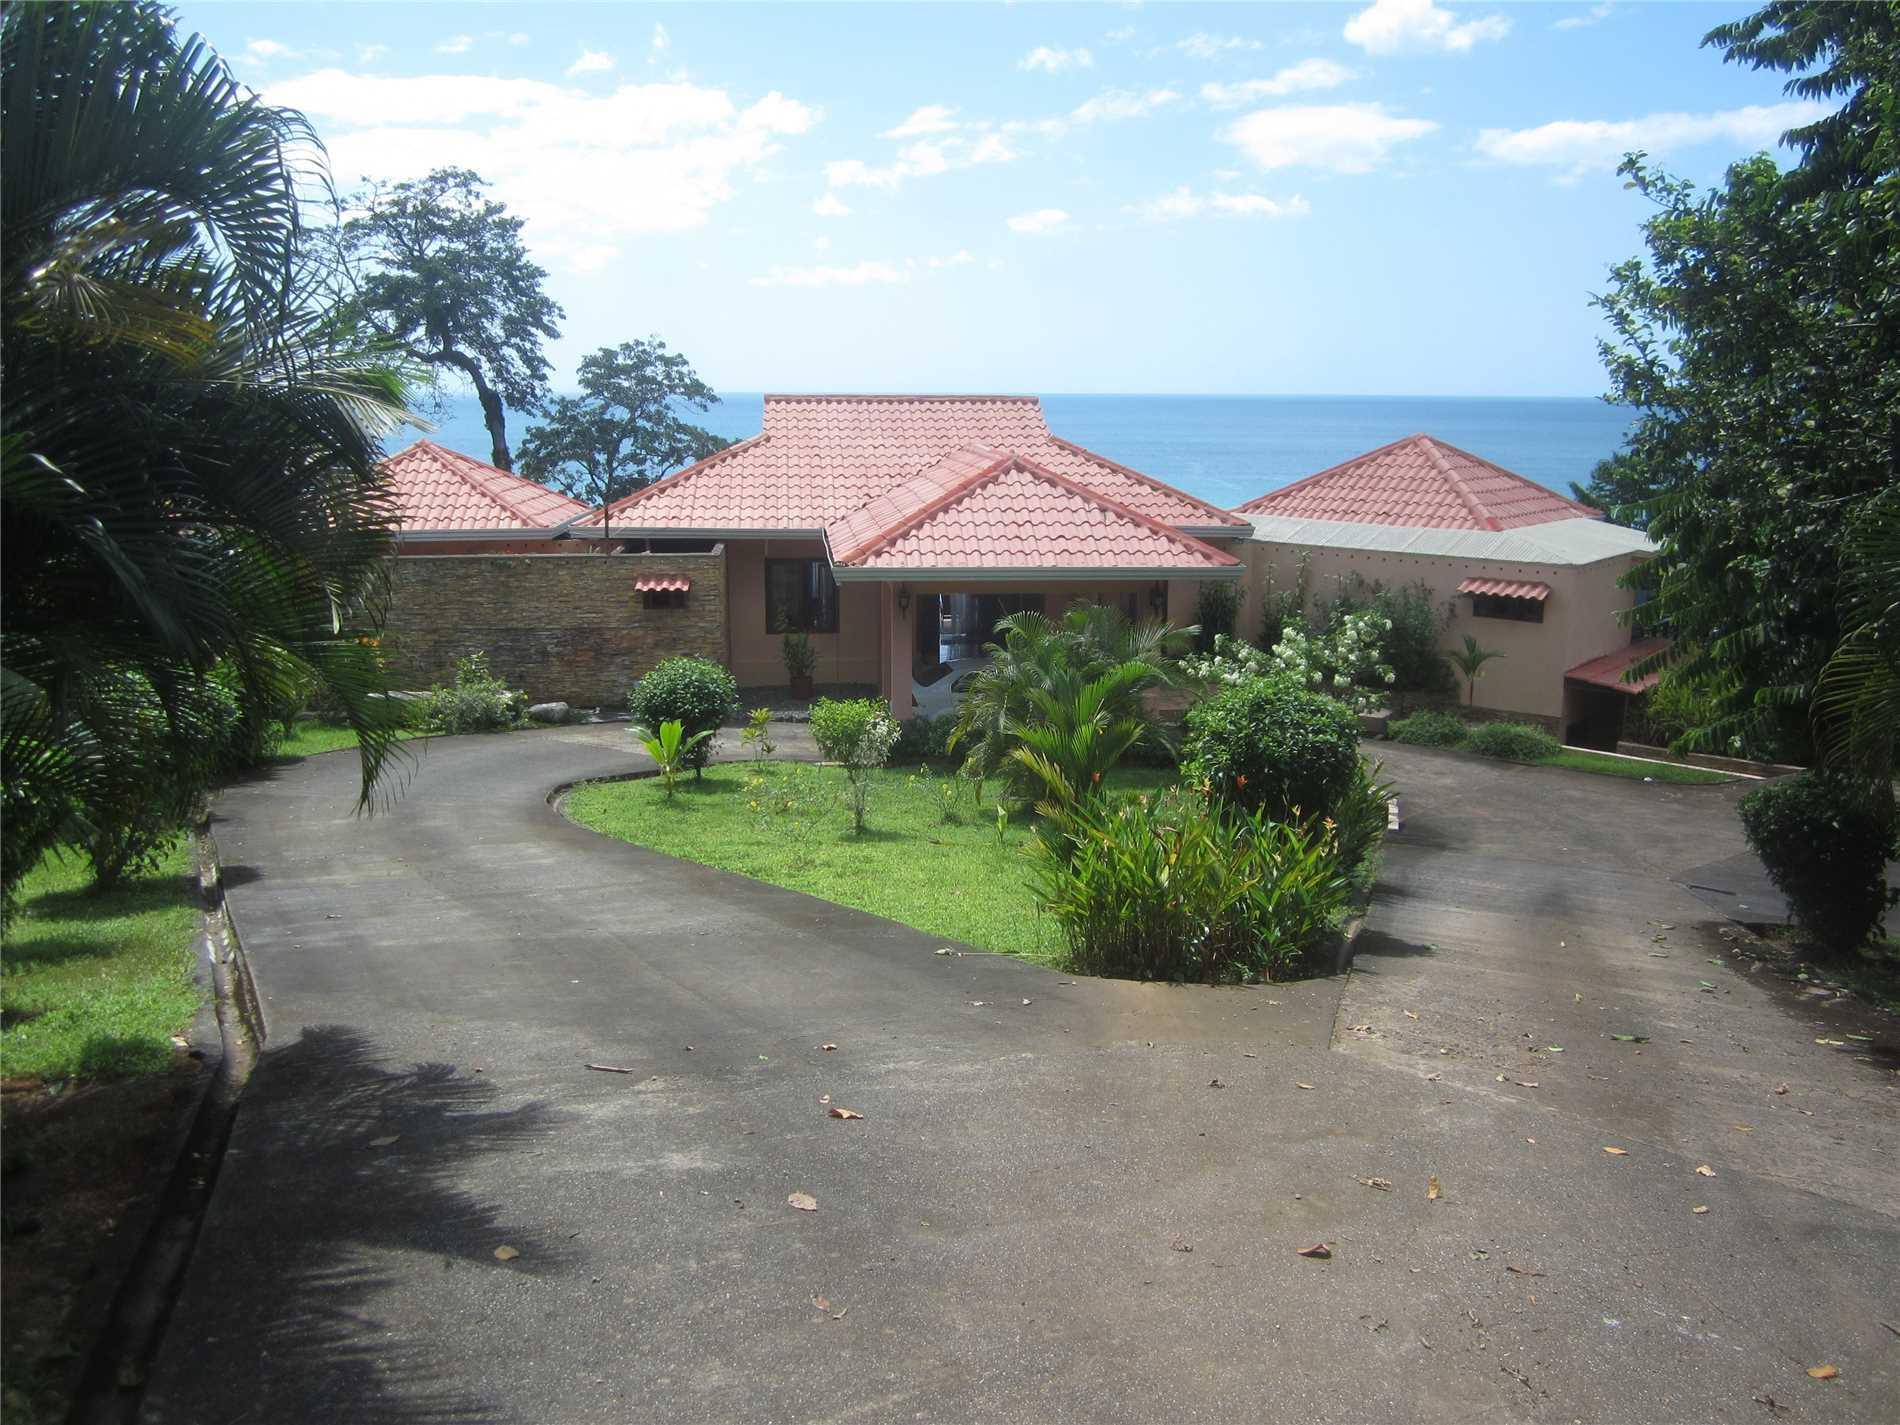 Lot 6 Casa Orillas Encanta St, Panama Z4464415